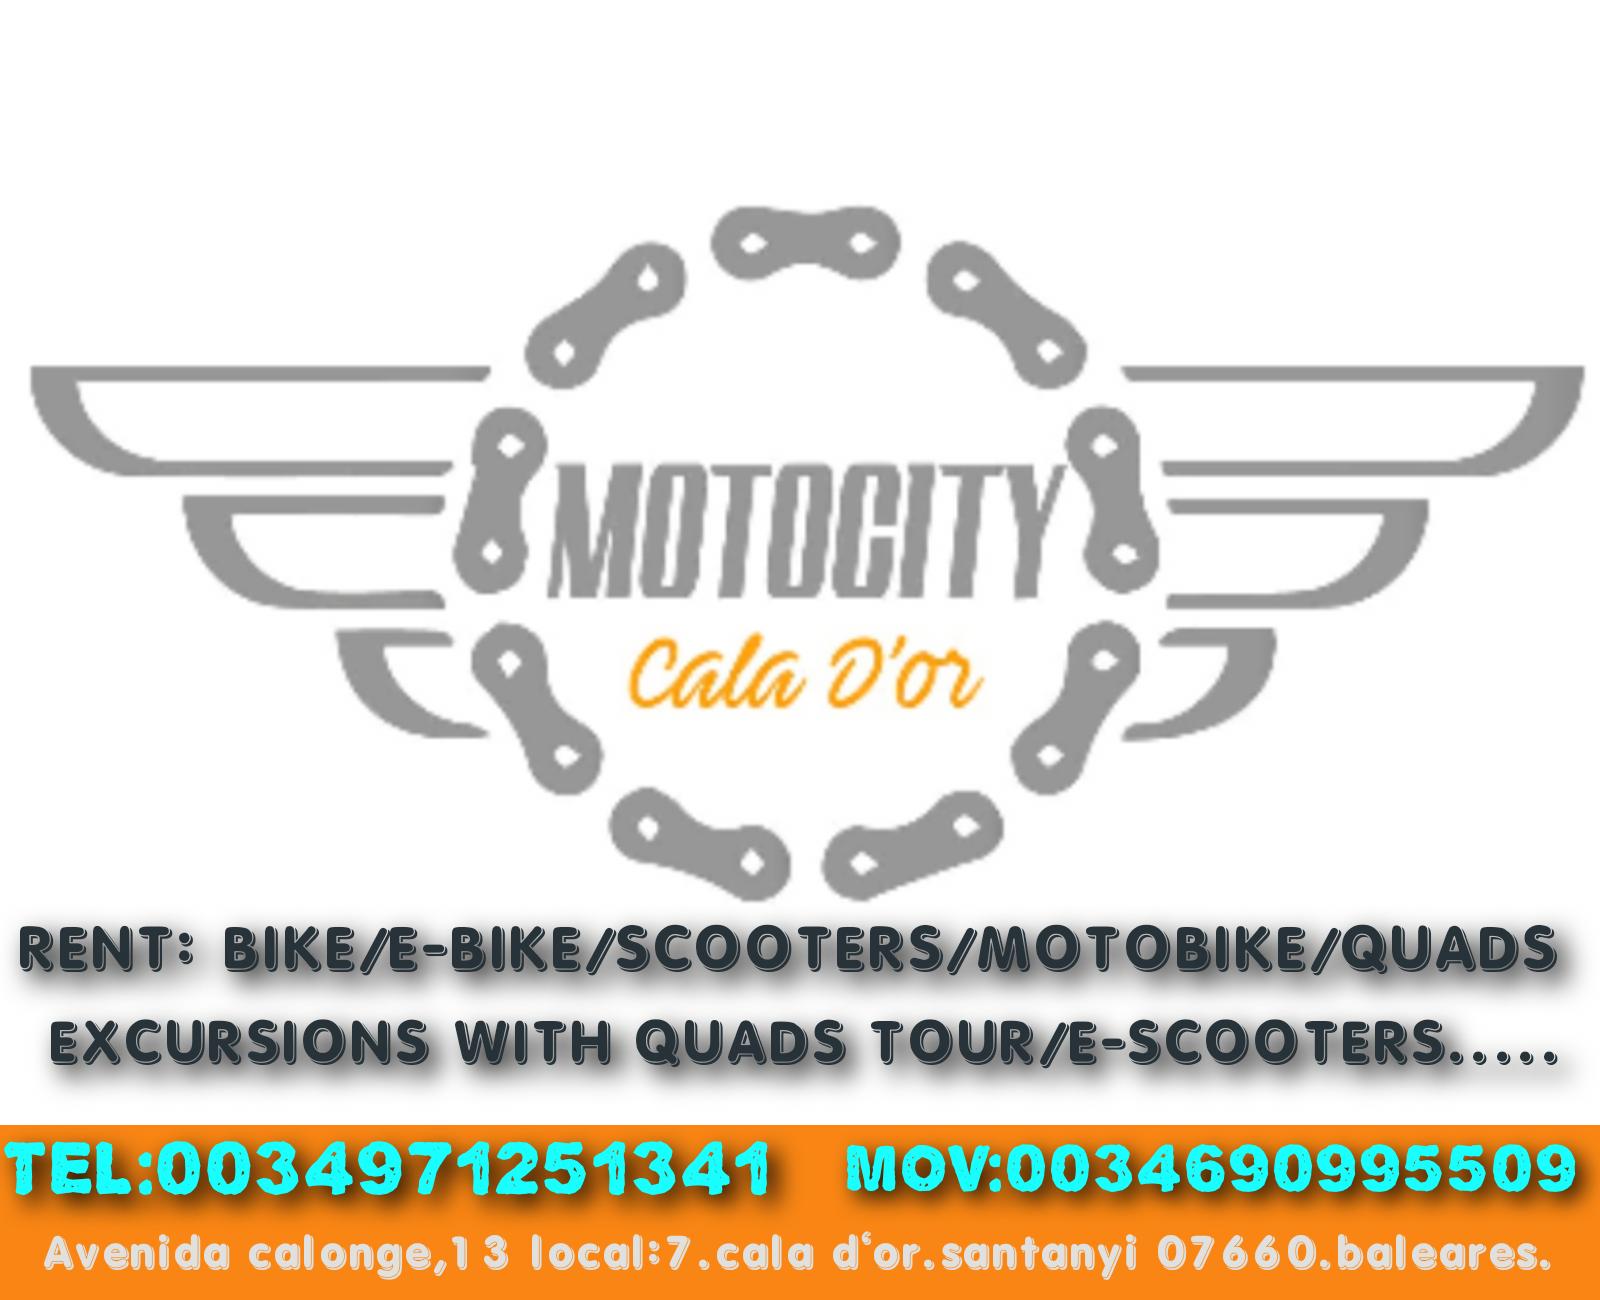 MOTOCITY CALA D'OR